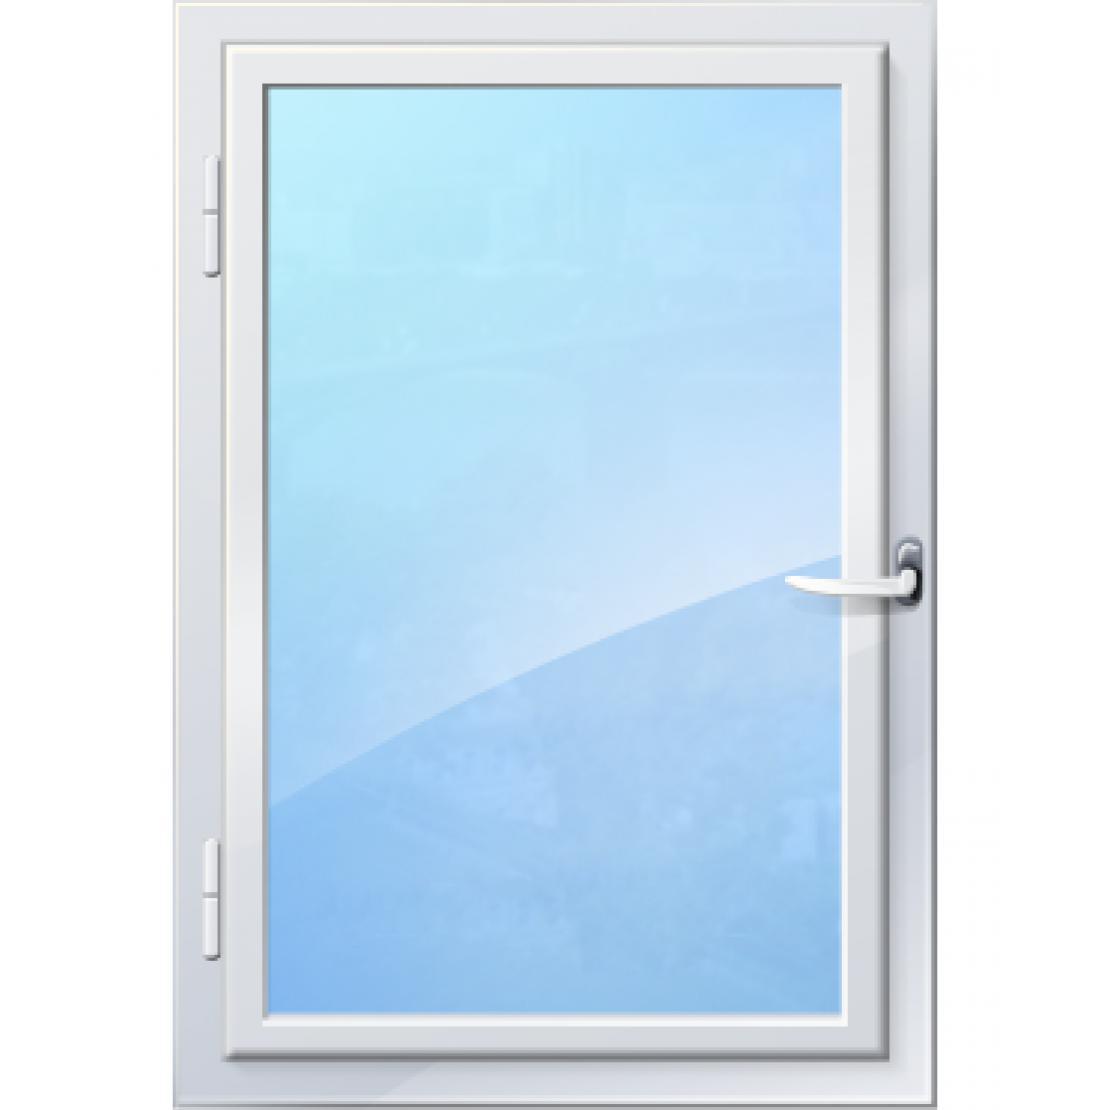 одностворчатое окно фото